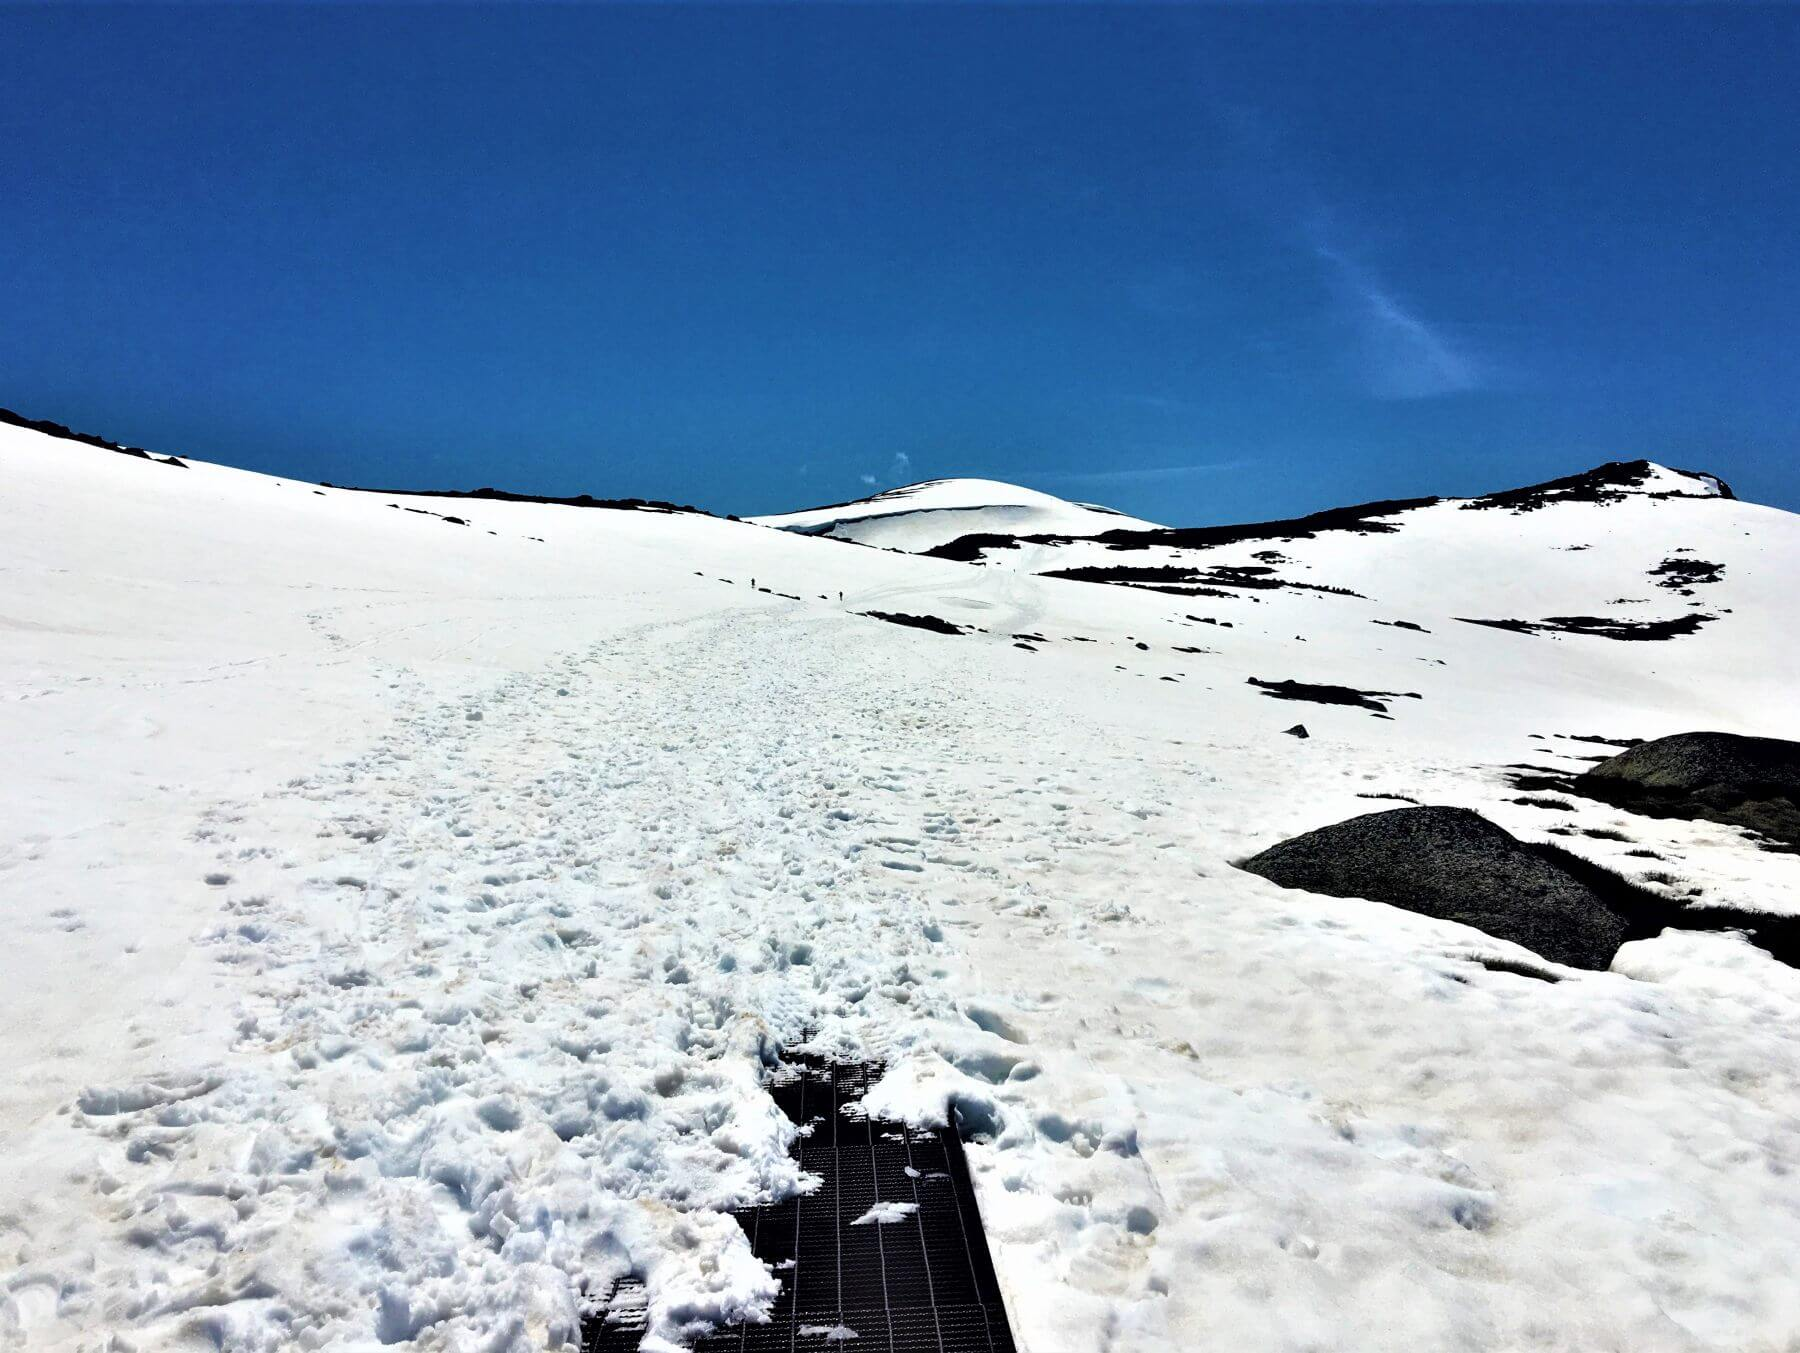 Höchster Berg in Australien